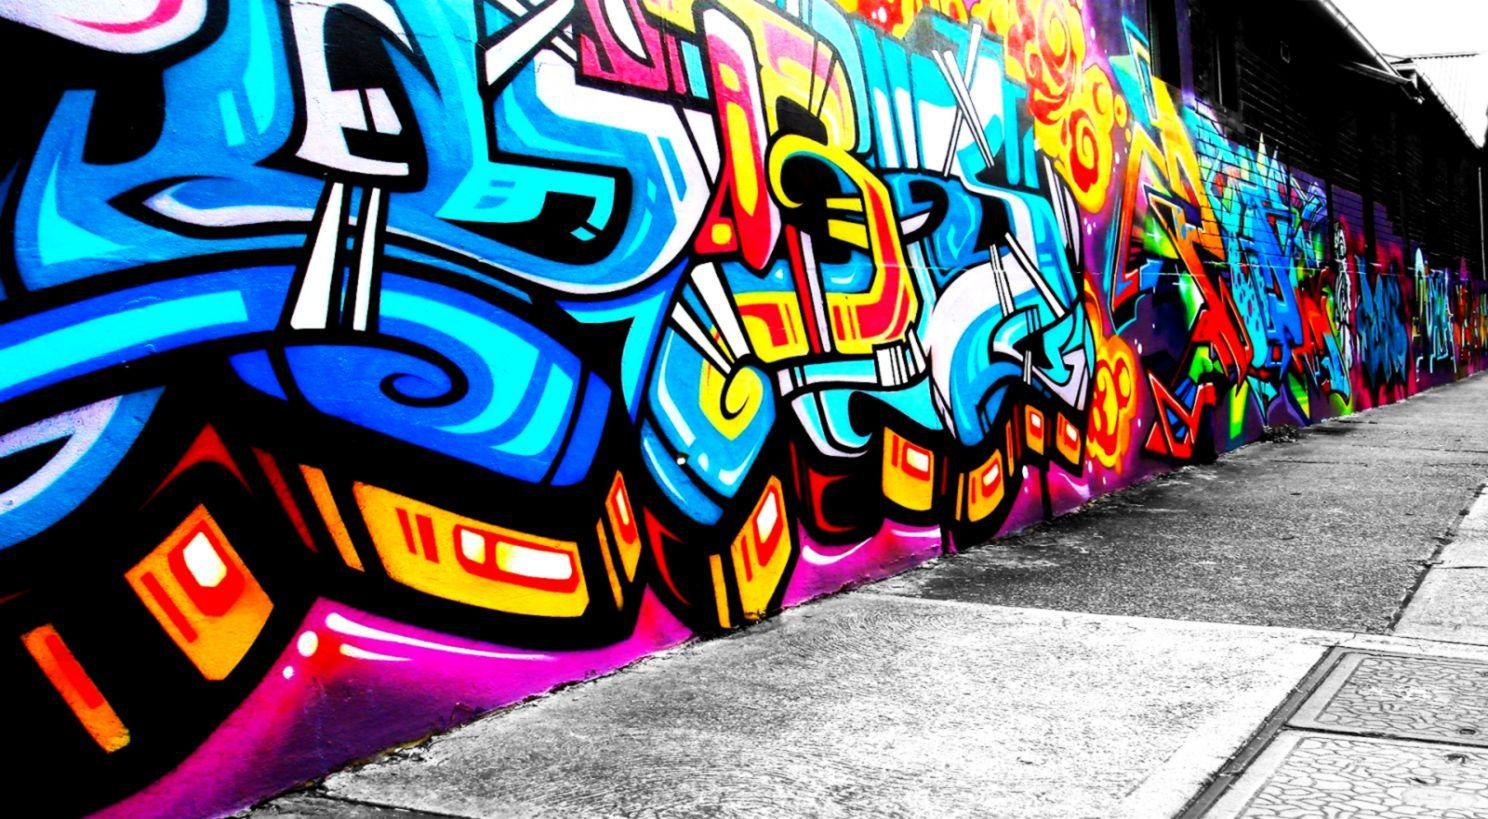 Cool Art Wallpaper Graffiti Wall - Wall Graffiti Art Background , HD Wallpaper & Backgrounds